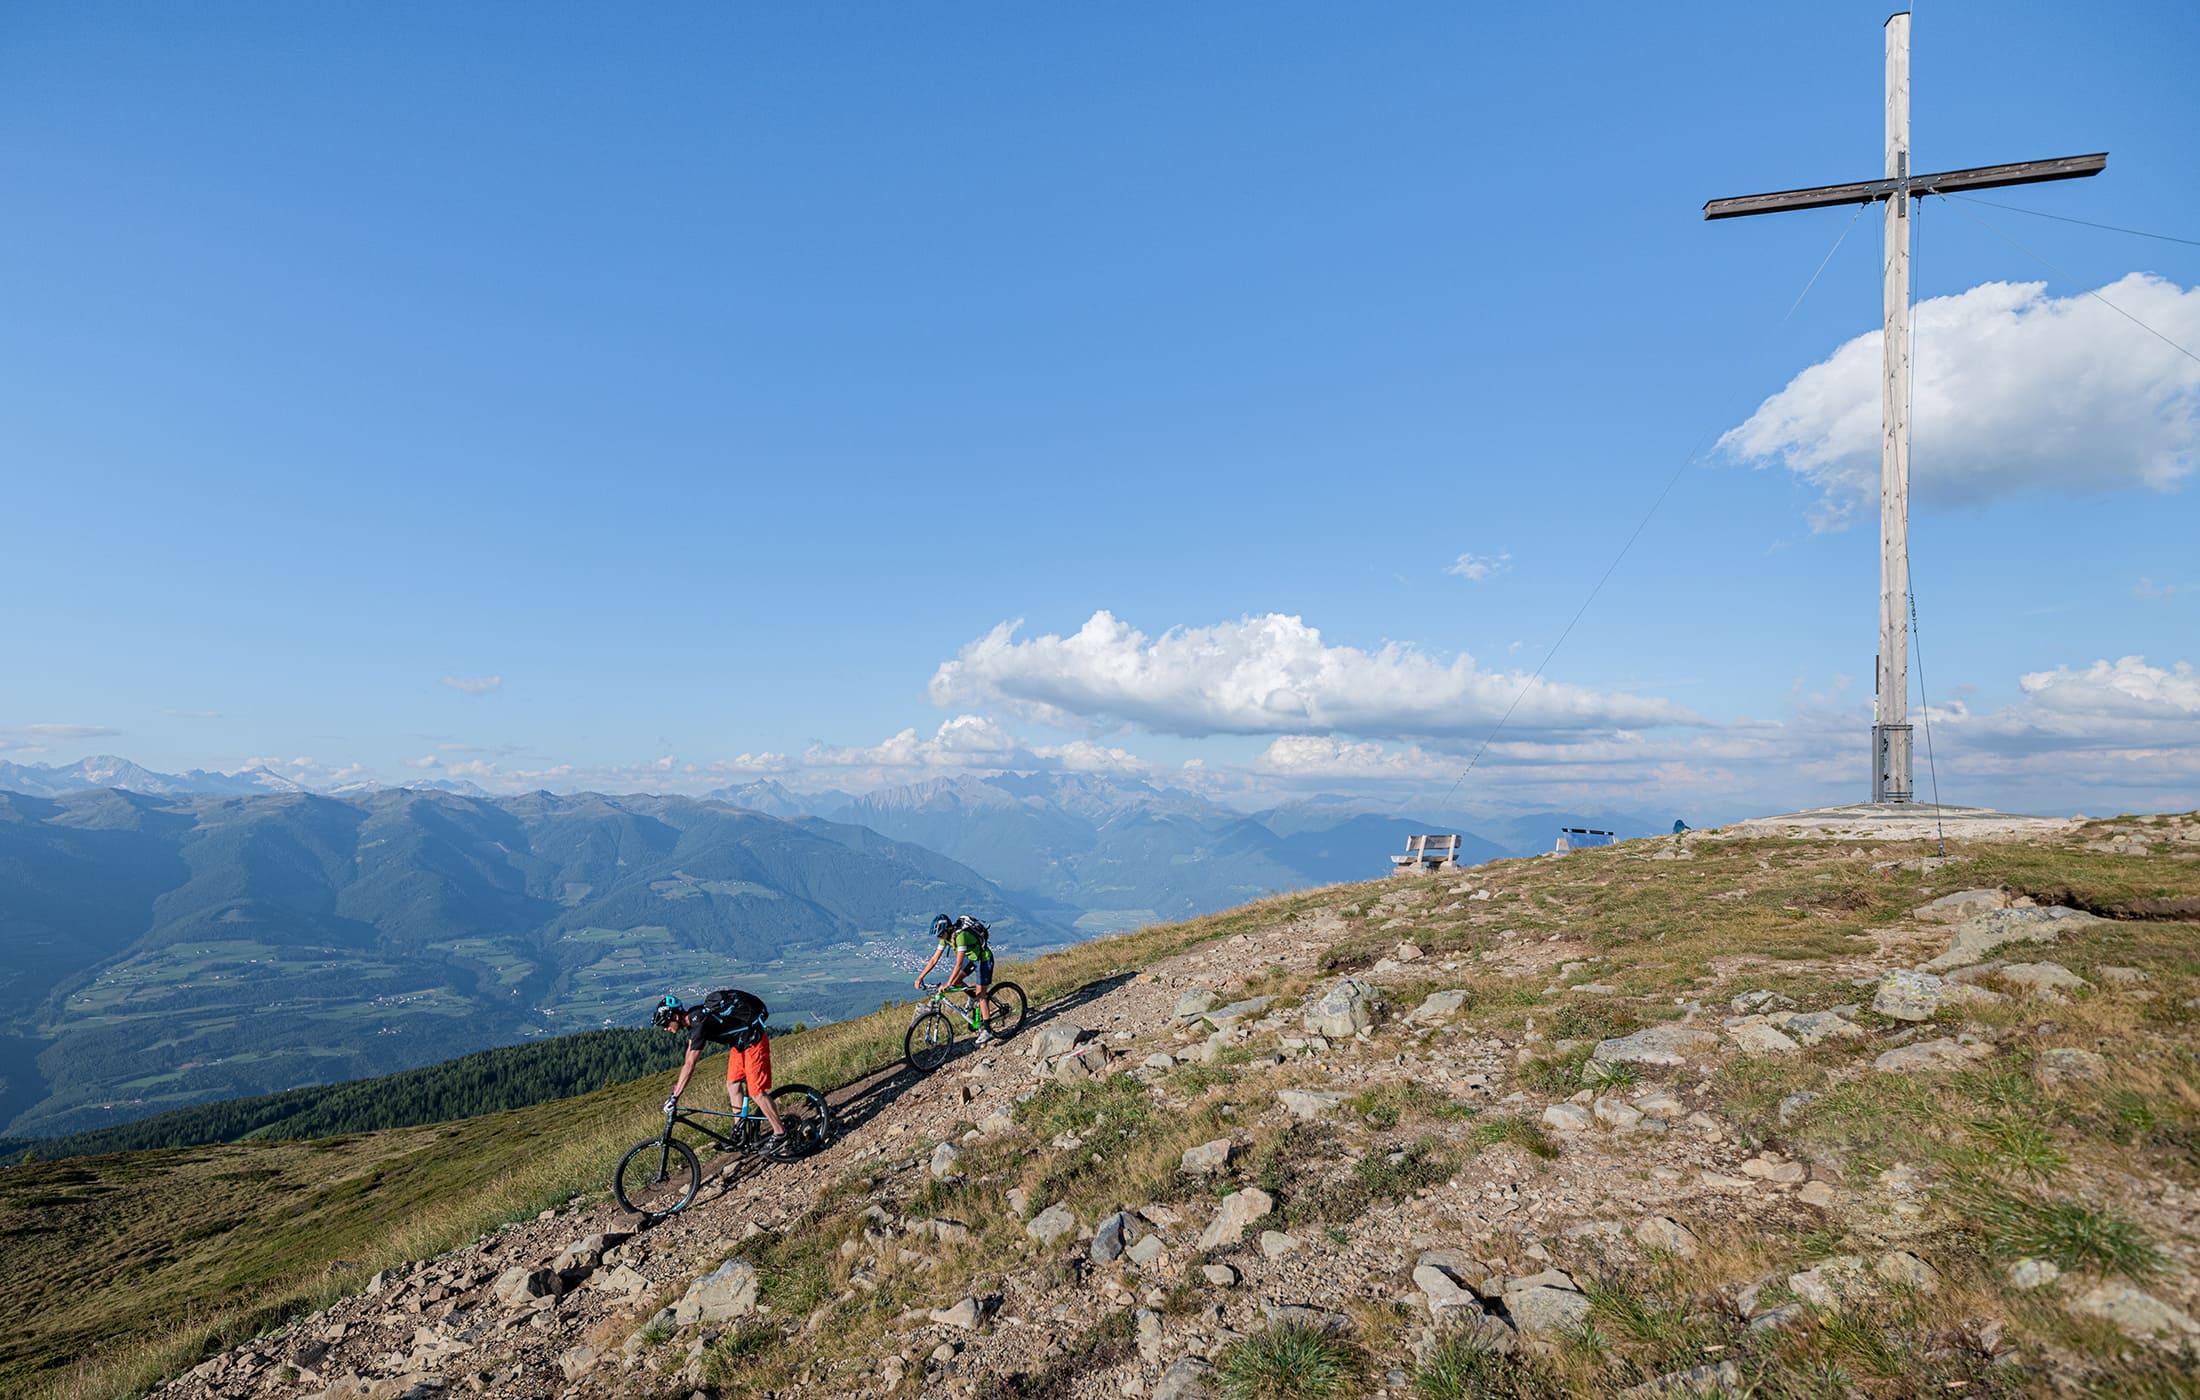 Christlrumerhof Slide Bike Stunt